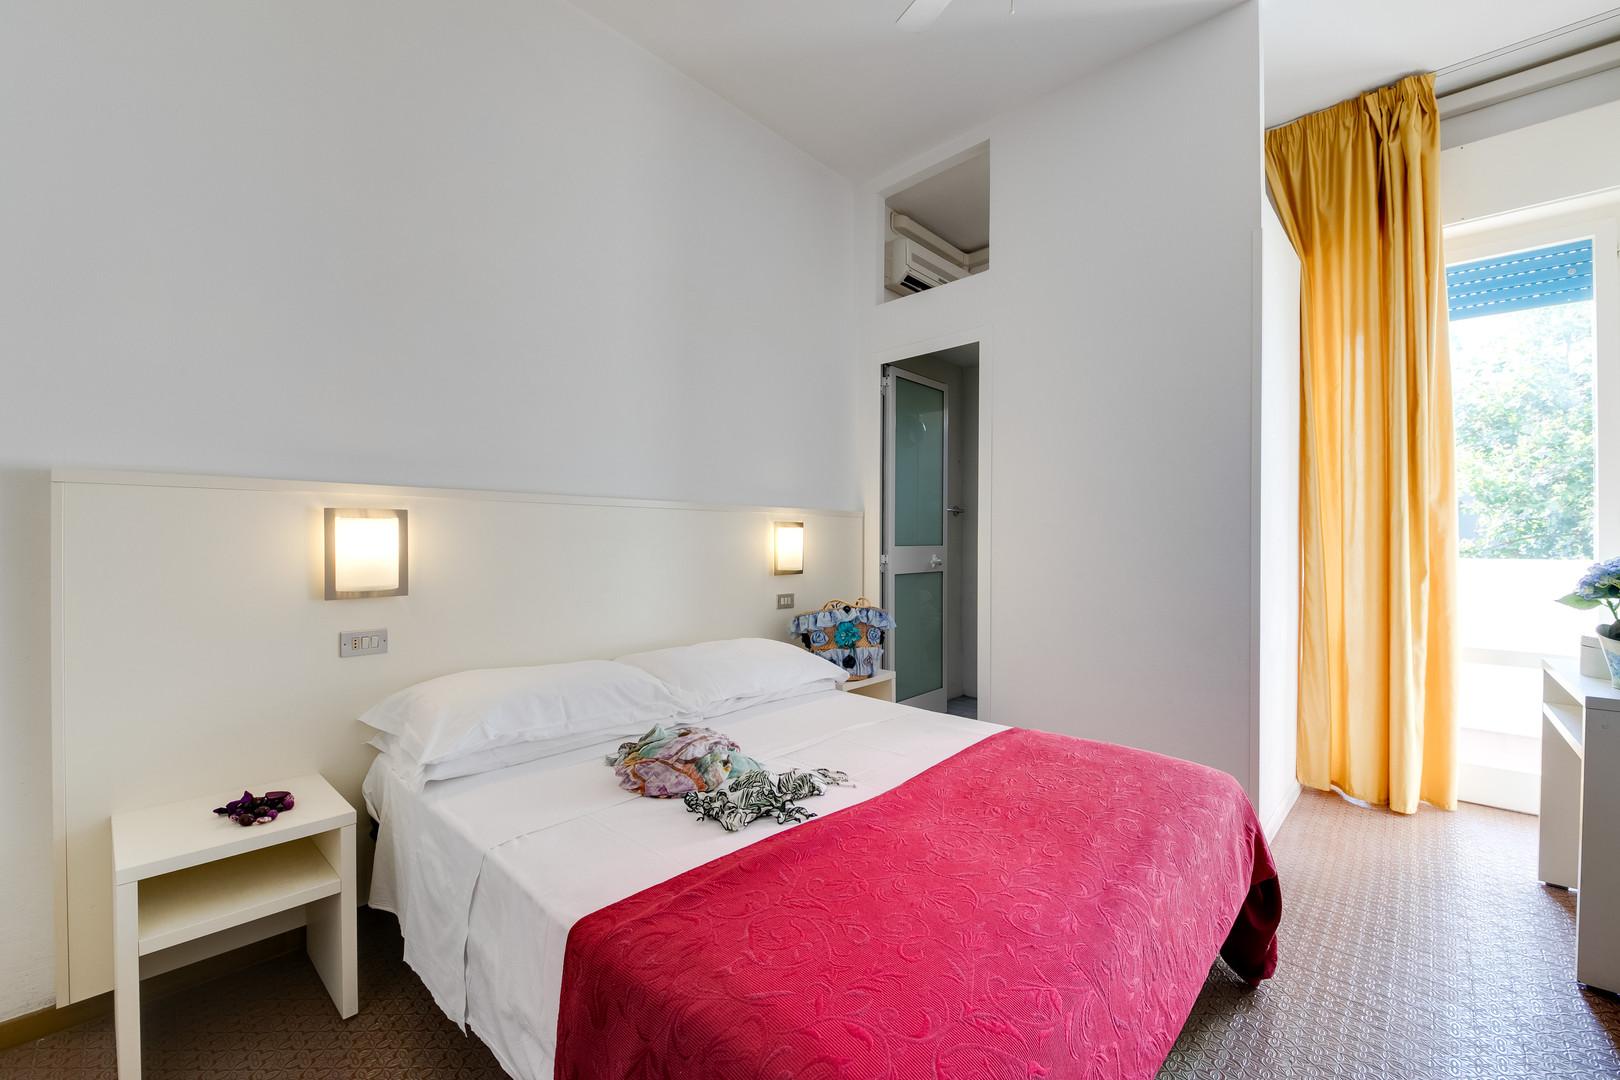 HOTEL FRANCESCA CAMERE BAGNI GIORGIO GRA